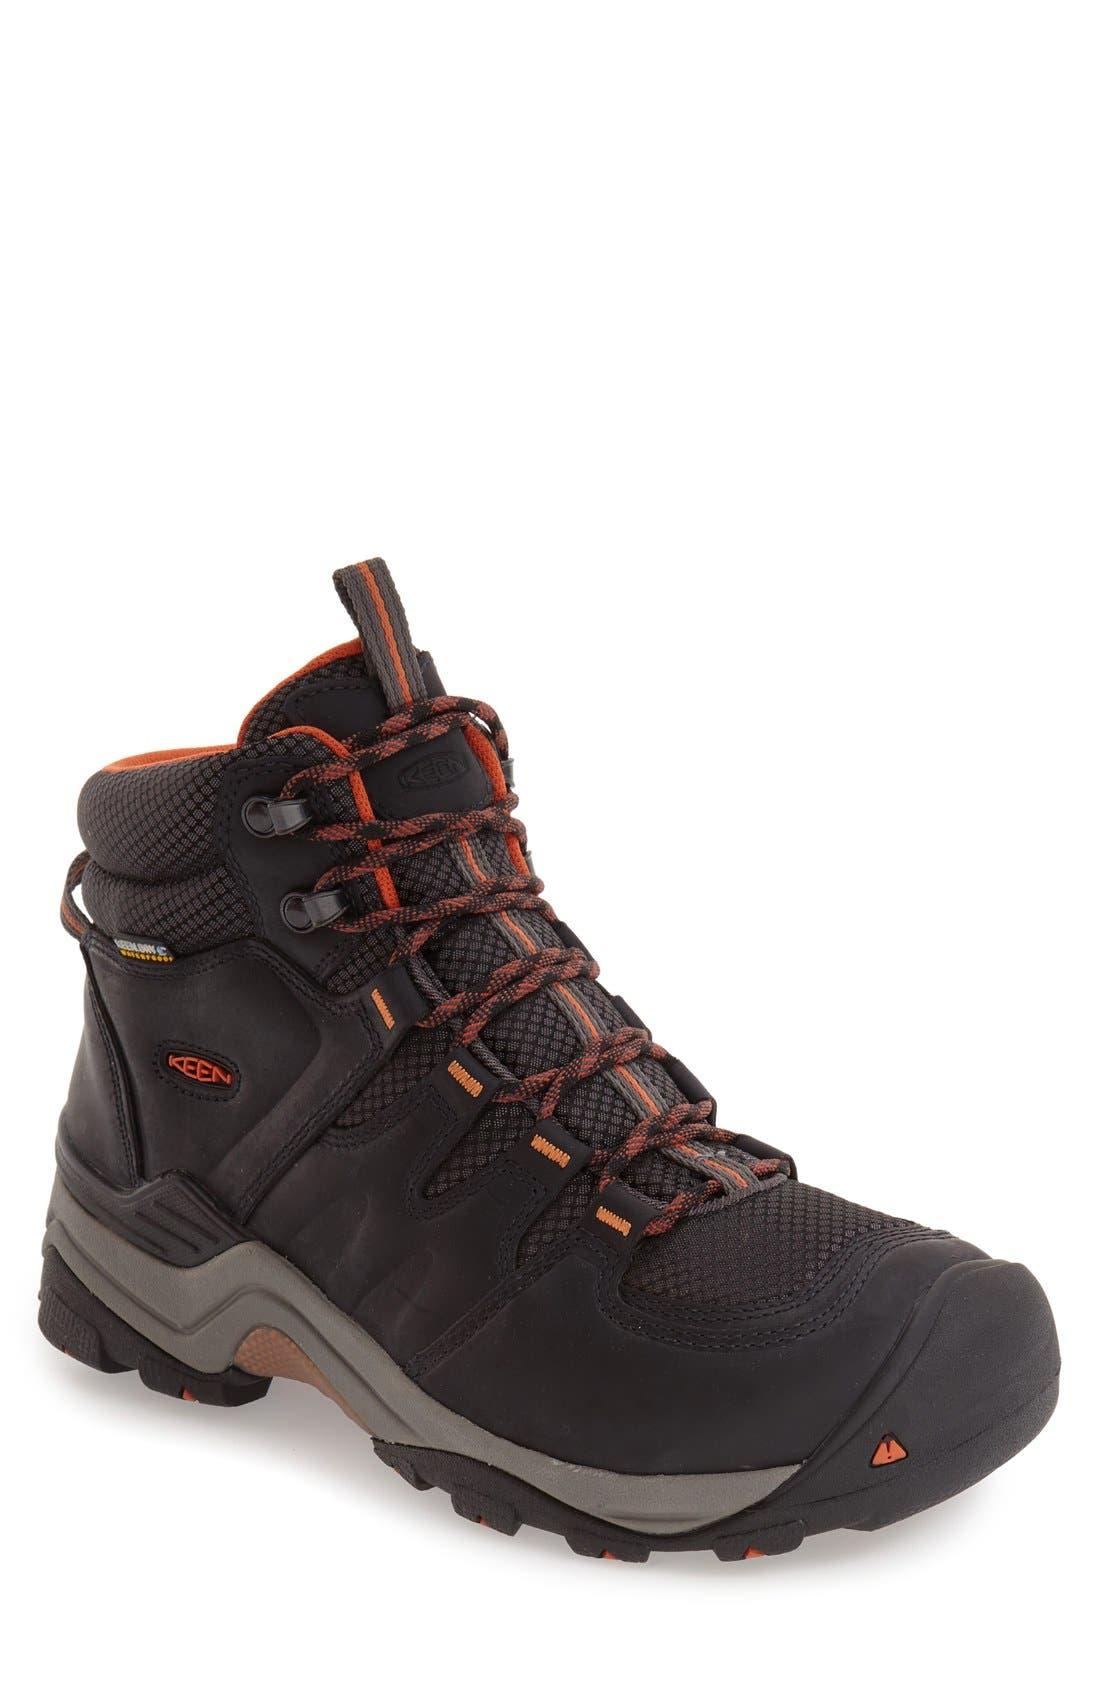 KEEN, Gypsum II Waterproof Hiking Boot, Main thumbnail 1, color, BLACK NUBUCK LEATHER